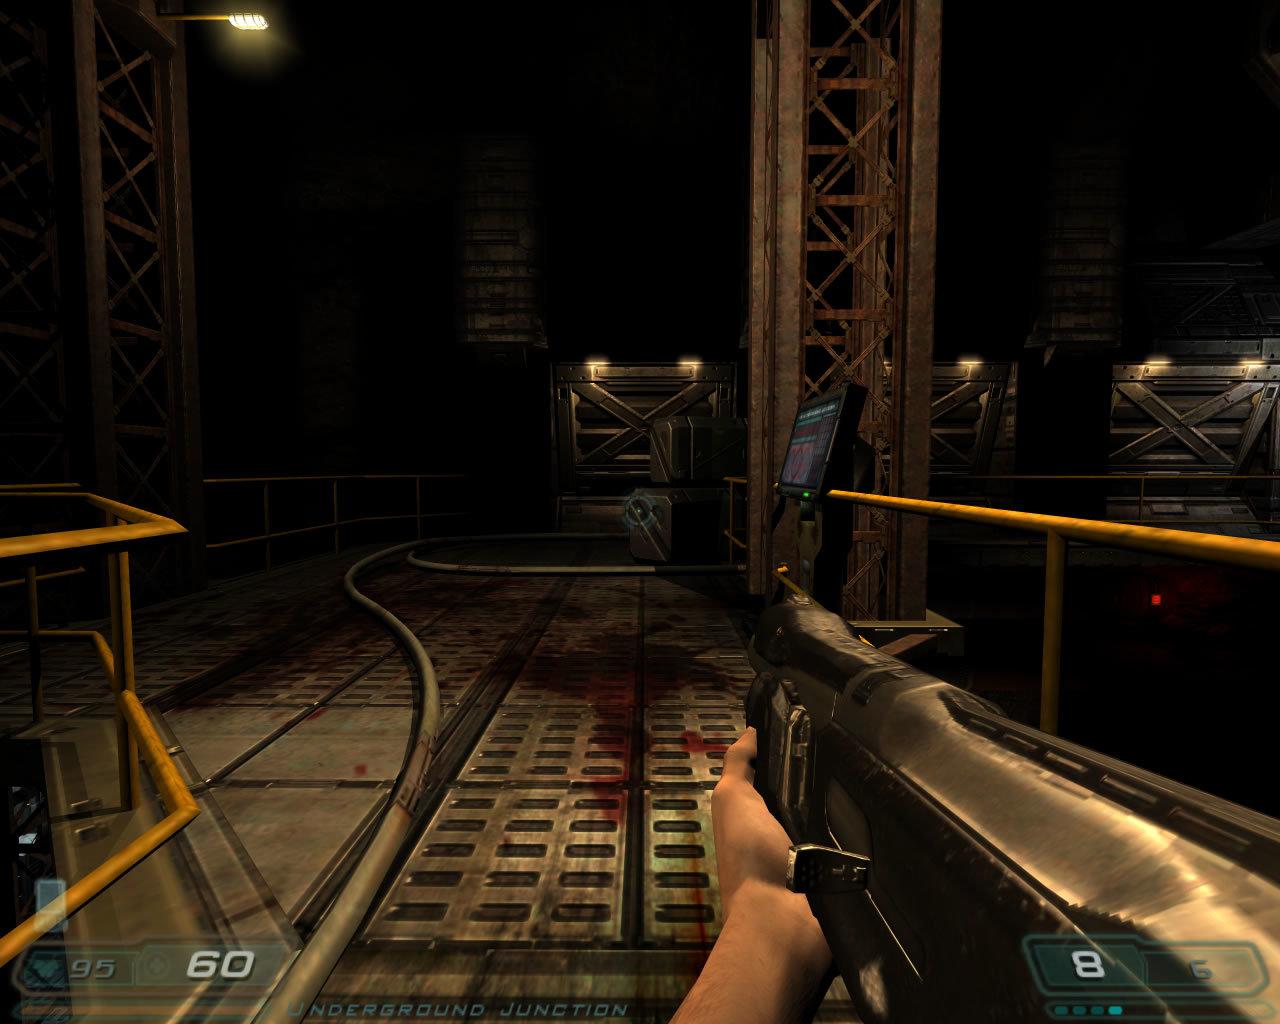 Doom 3 Medium Quality w/ 8x AA